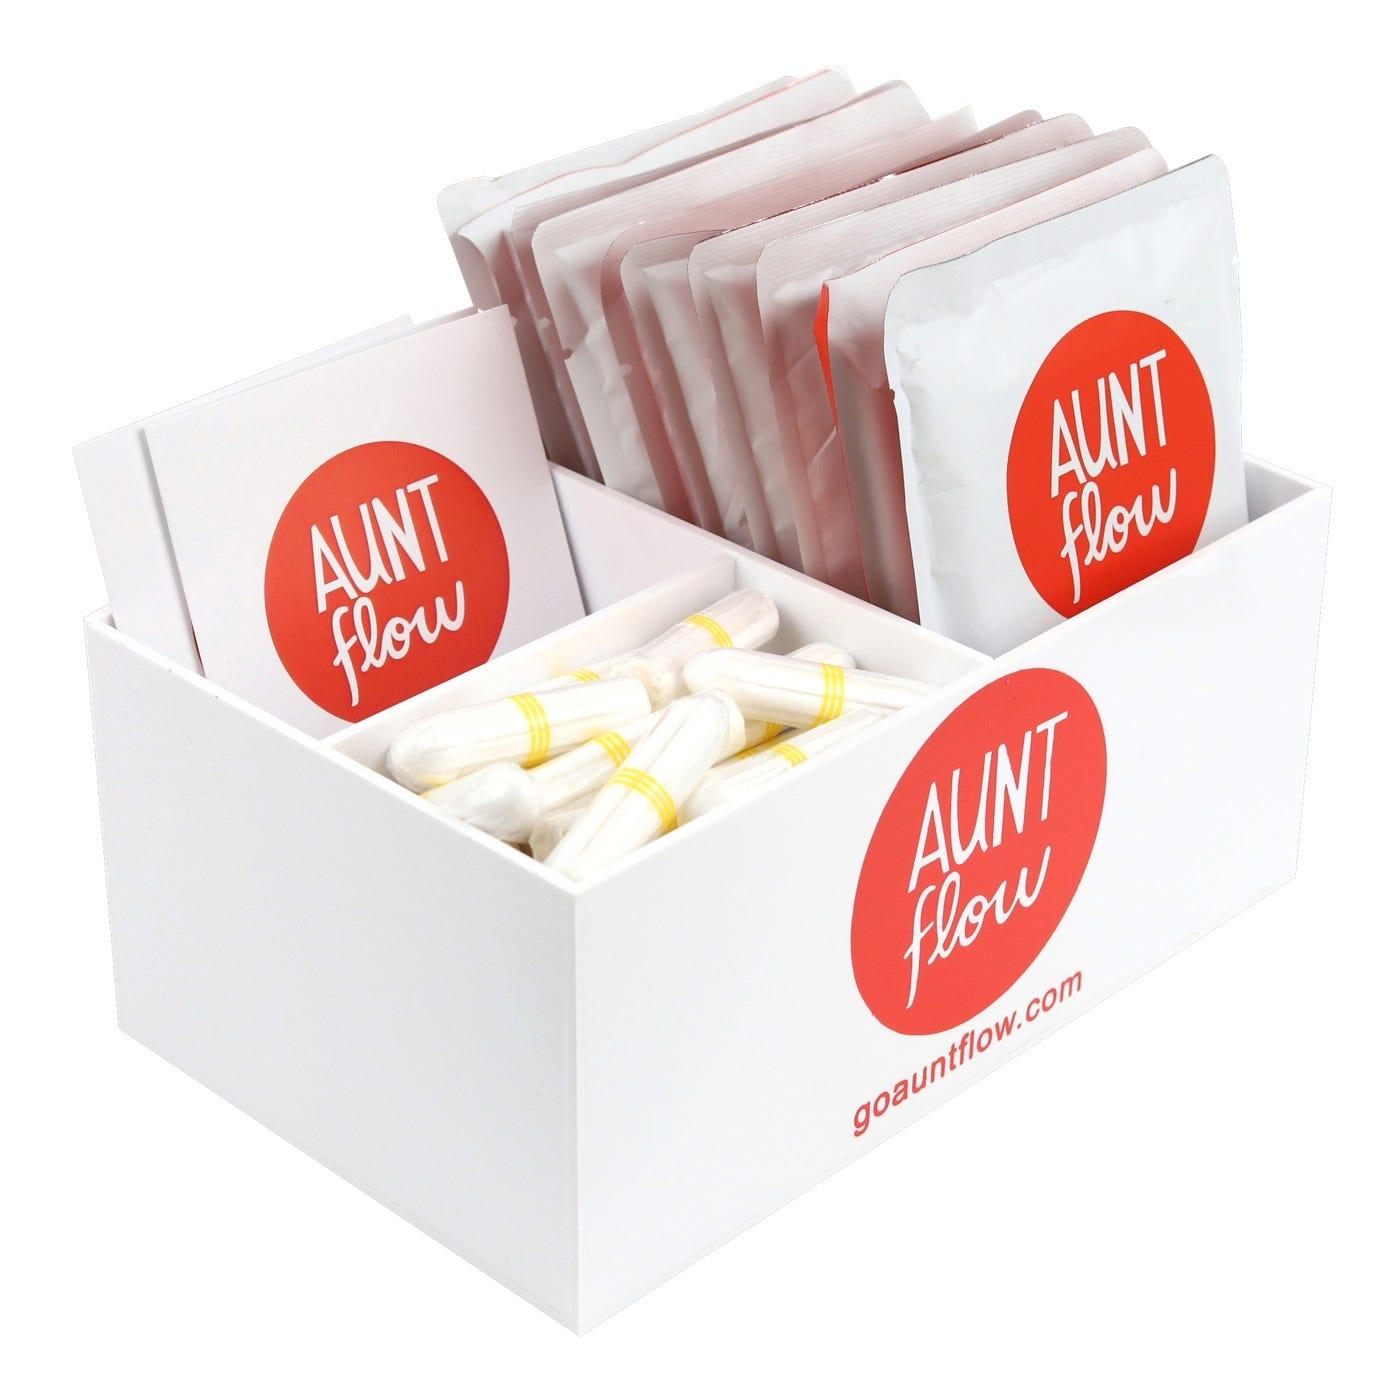 Aunt Flow Menstrual Products